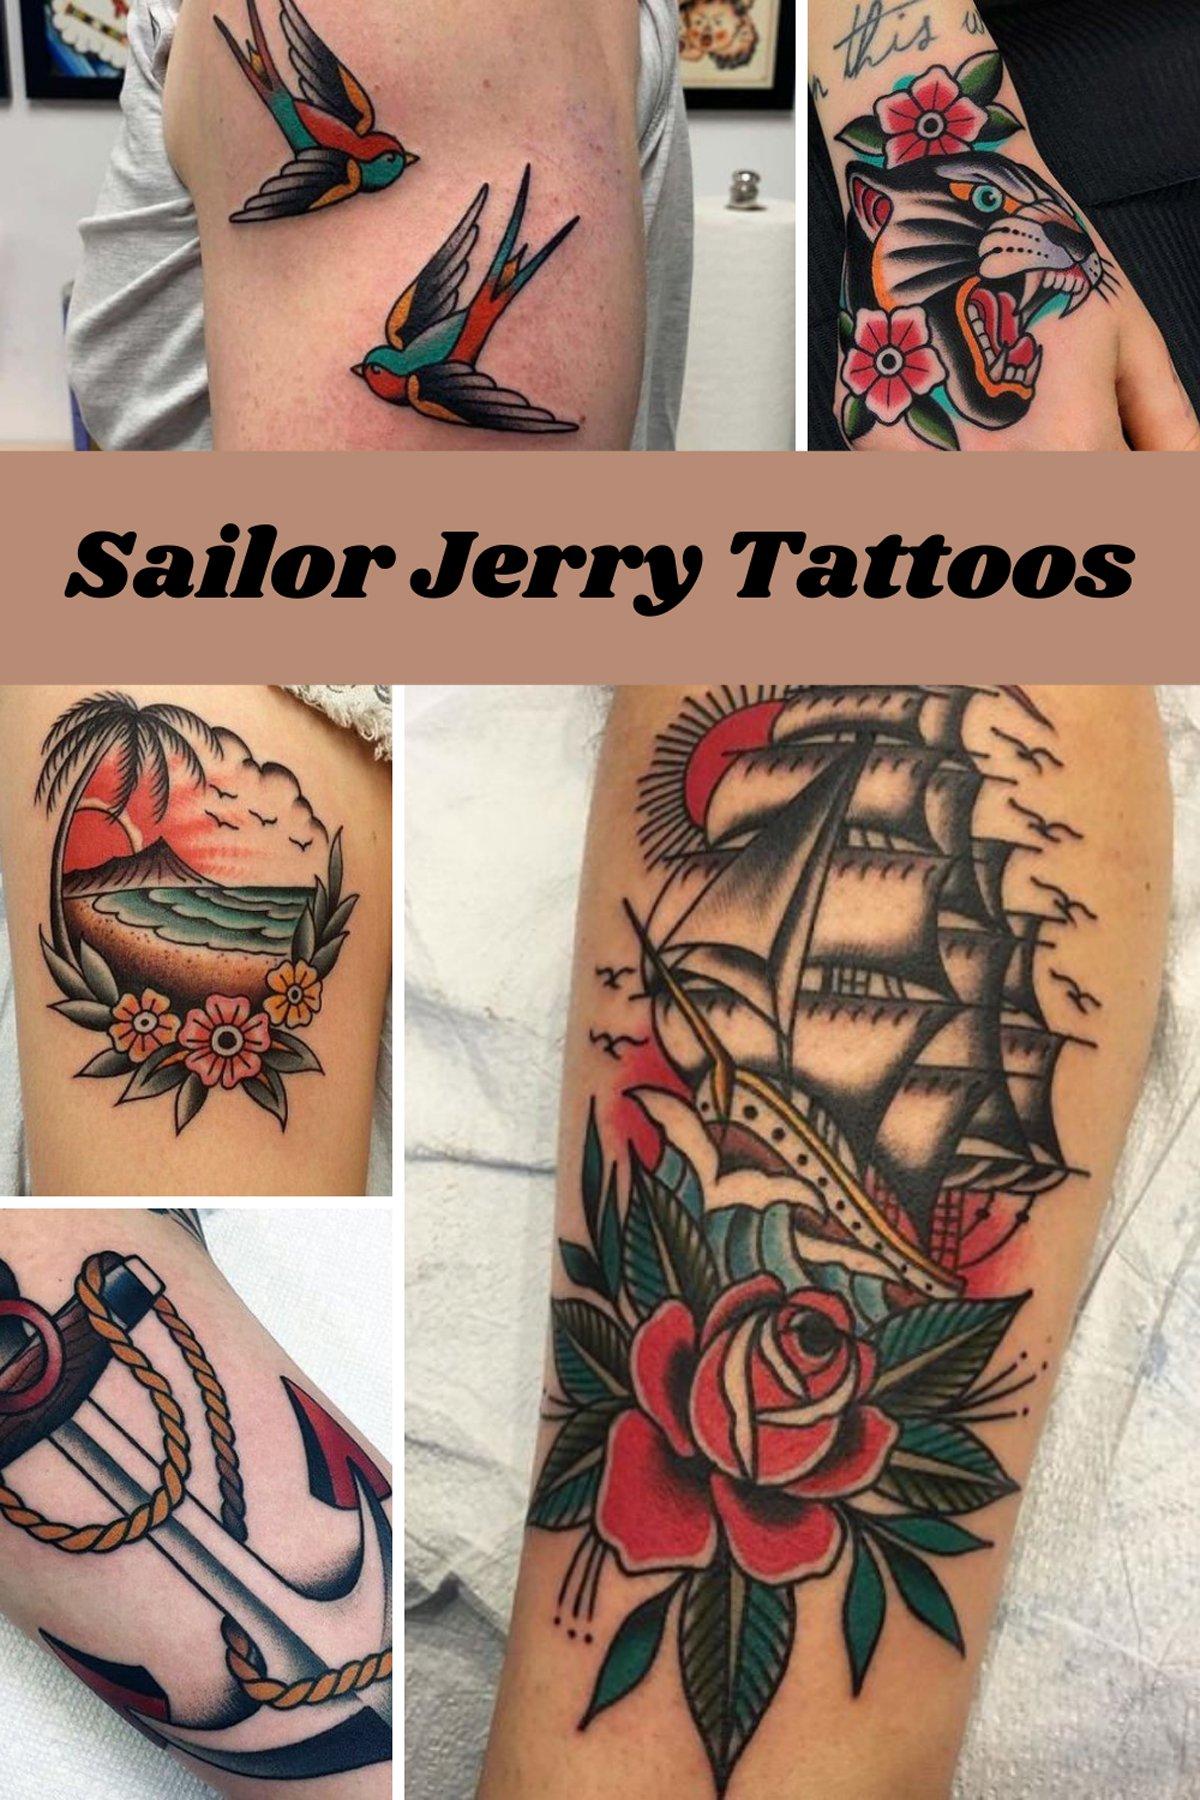 Sailor Jerry Tattoo Designs